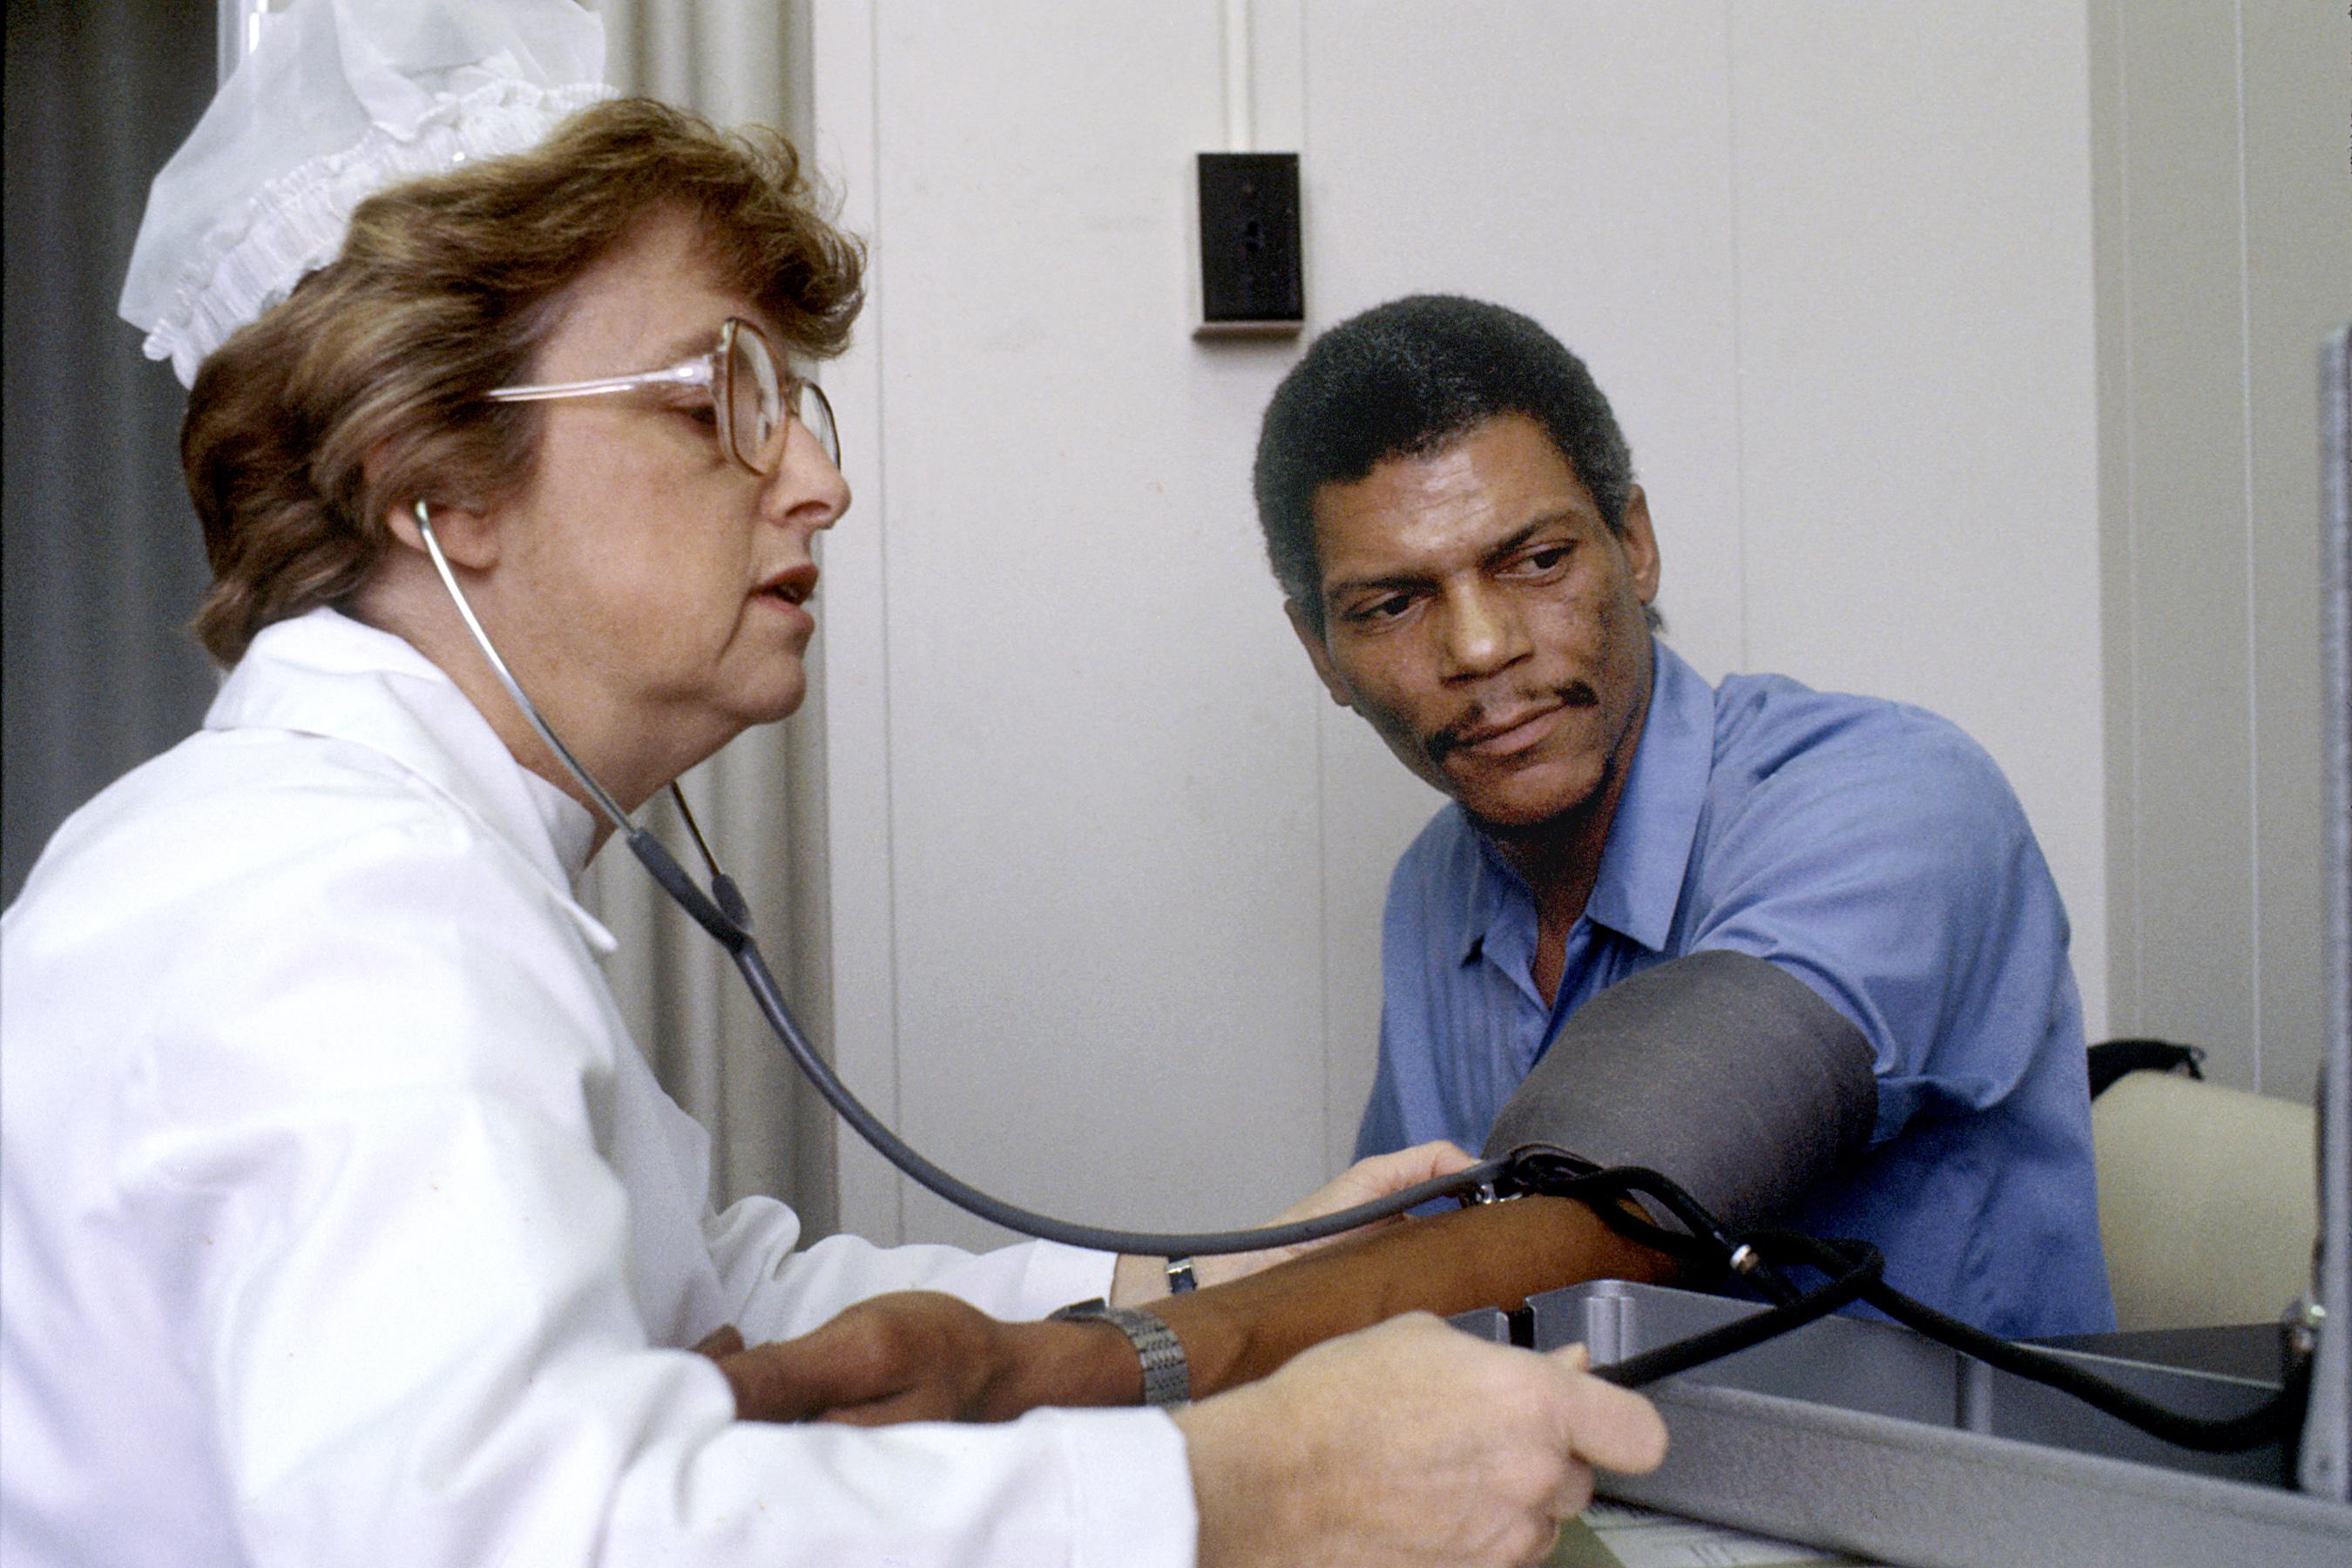 File:Nurse checks blood pressure.jpg - Wikimedia Commons